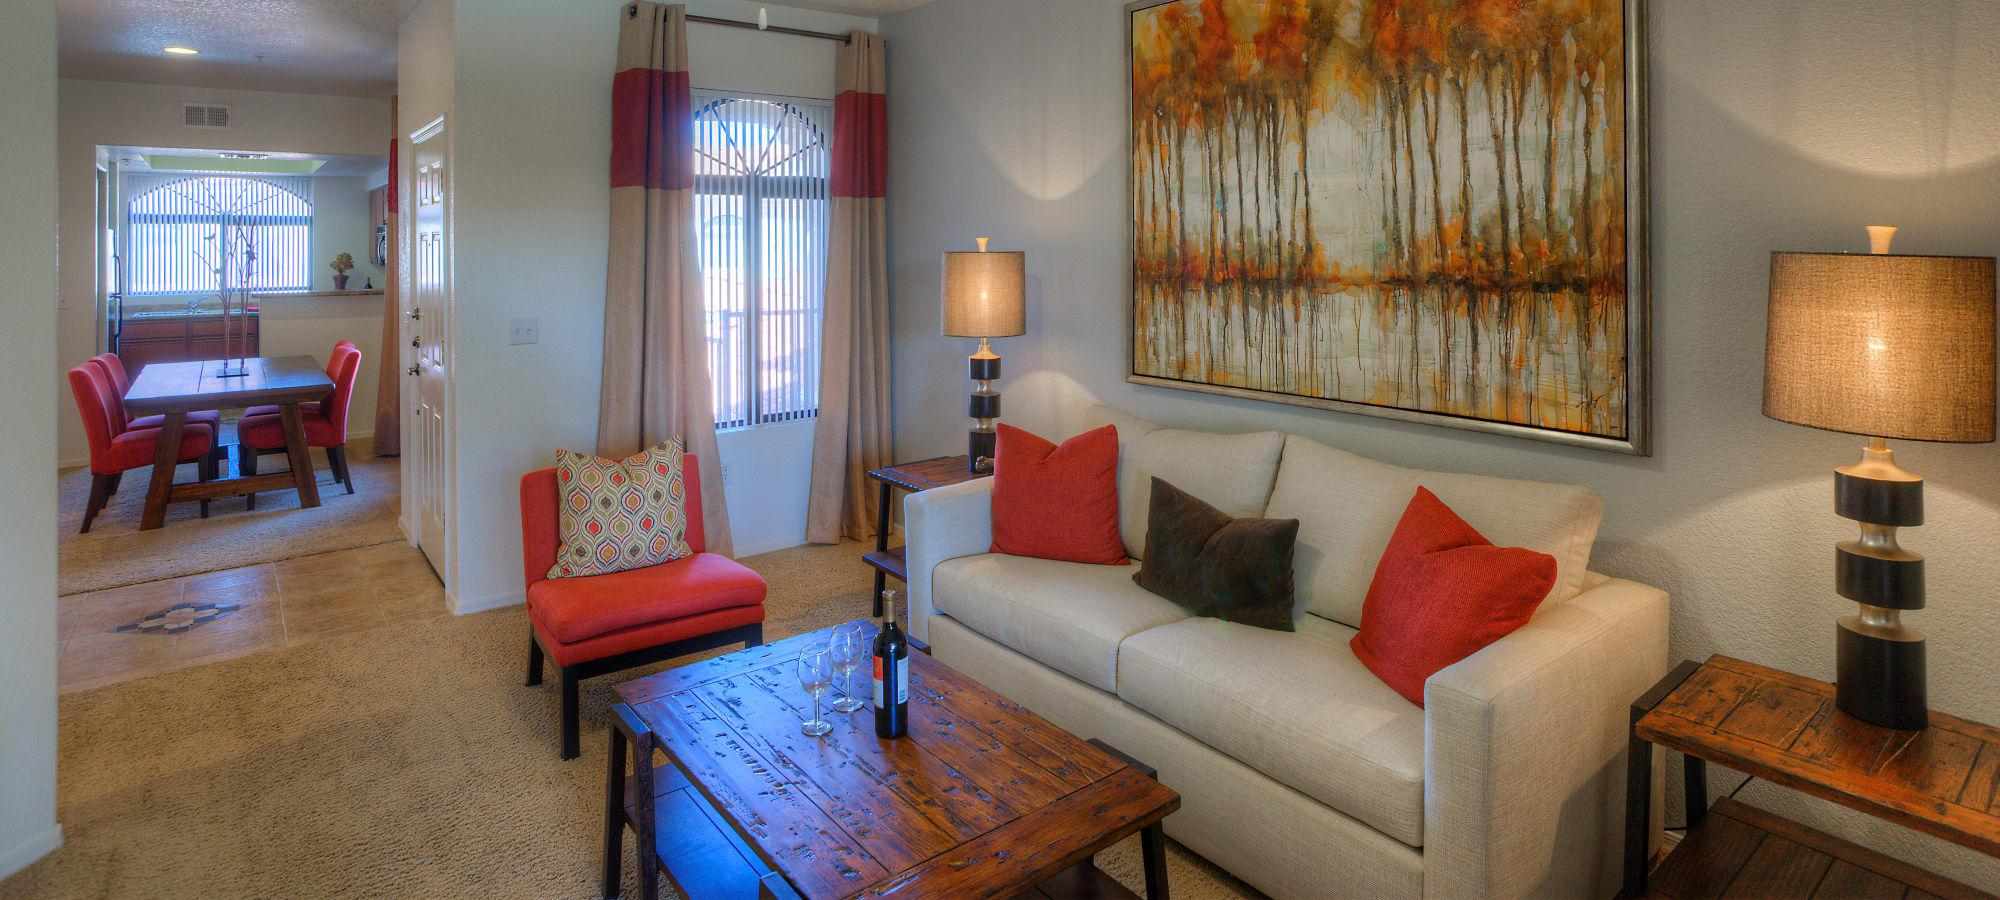 Lovely model living room and dining room at San Prado in Glendale, Arizona